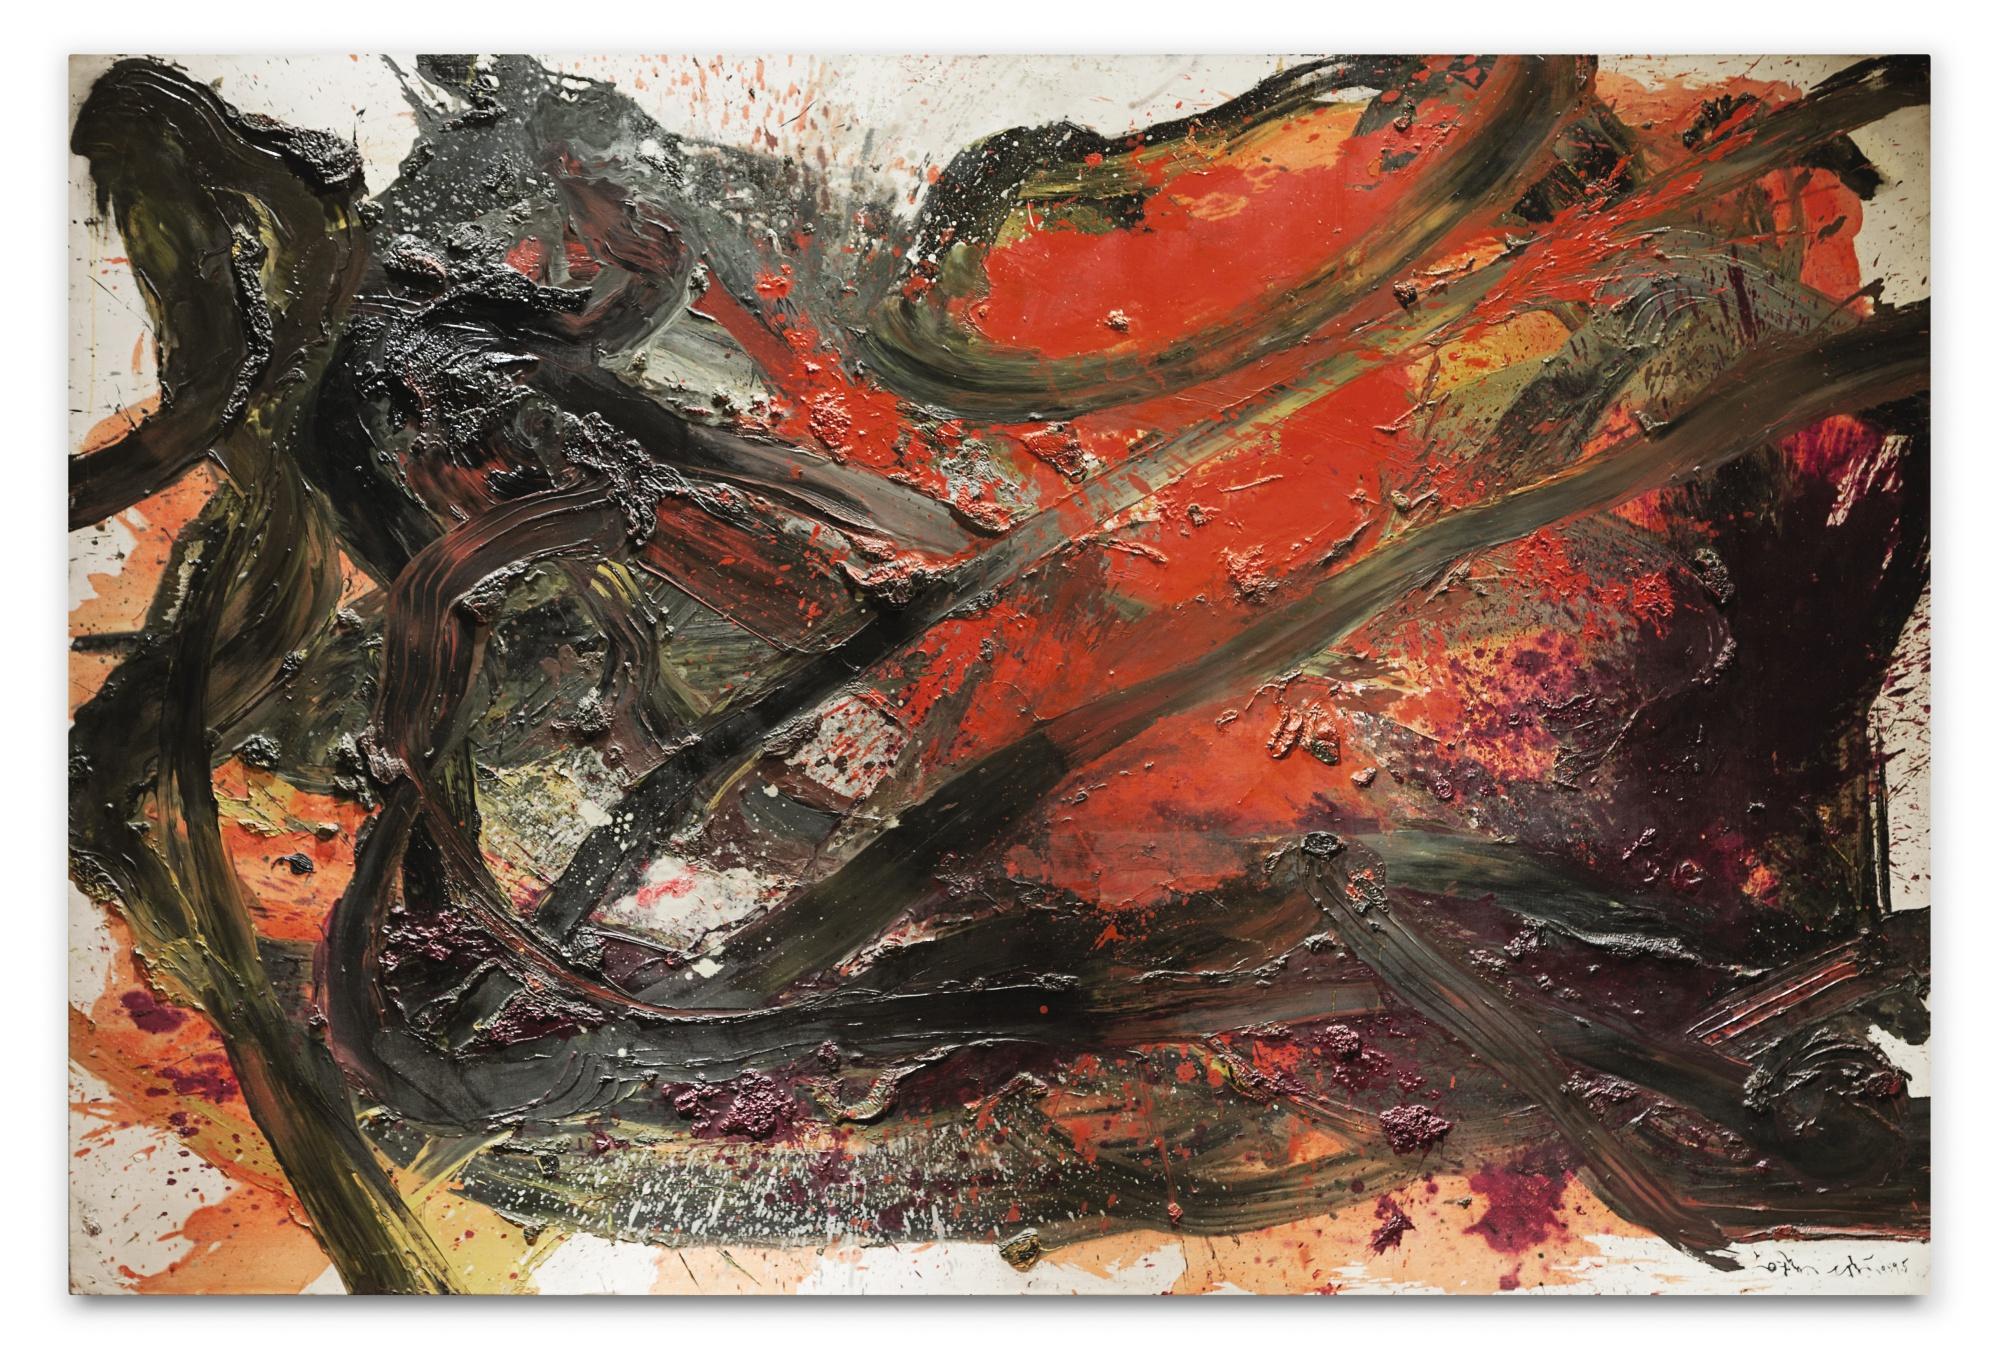 Kazuo Shiraga, Takao, 8 731 400 euros chez Sotheby's en juin 2018, image via Auctionlab News